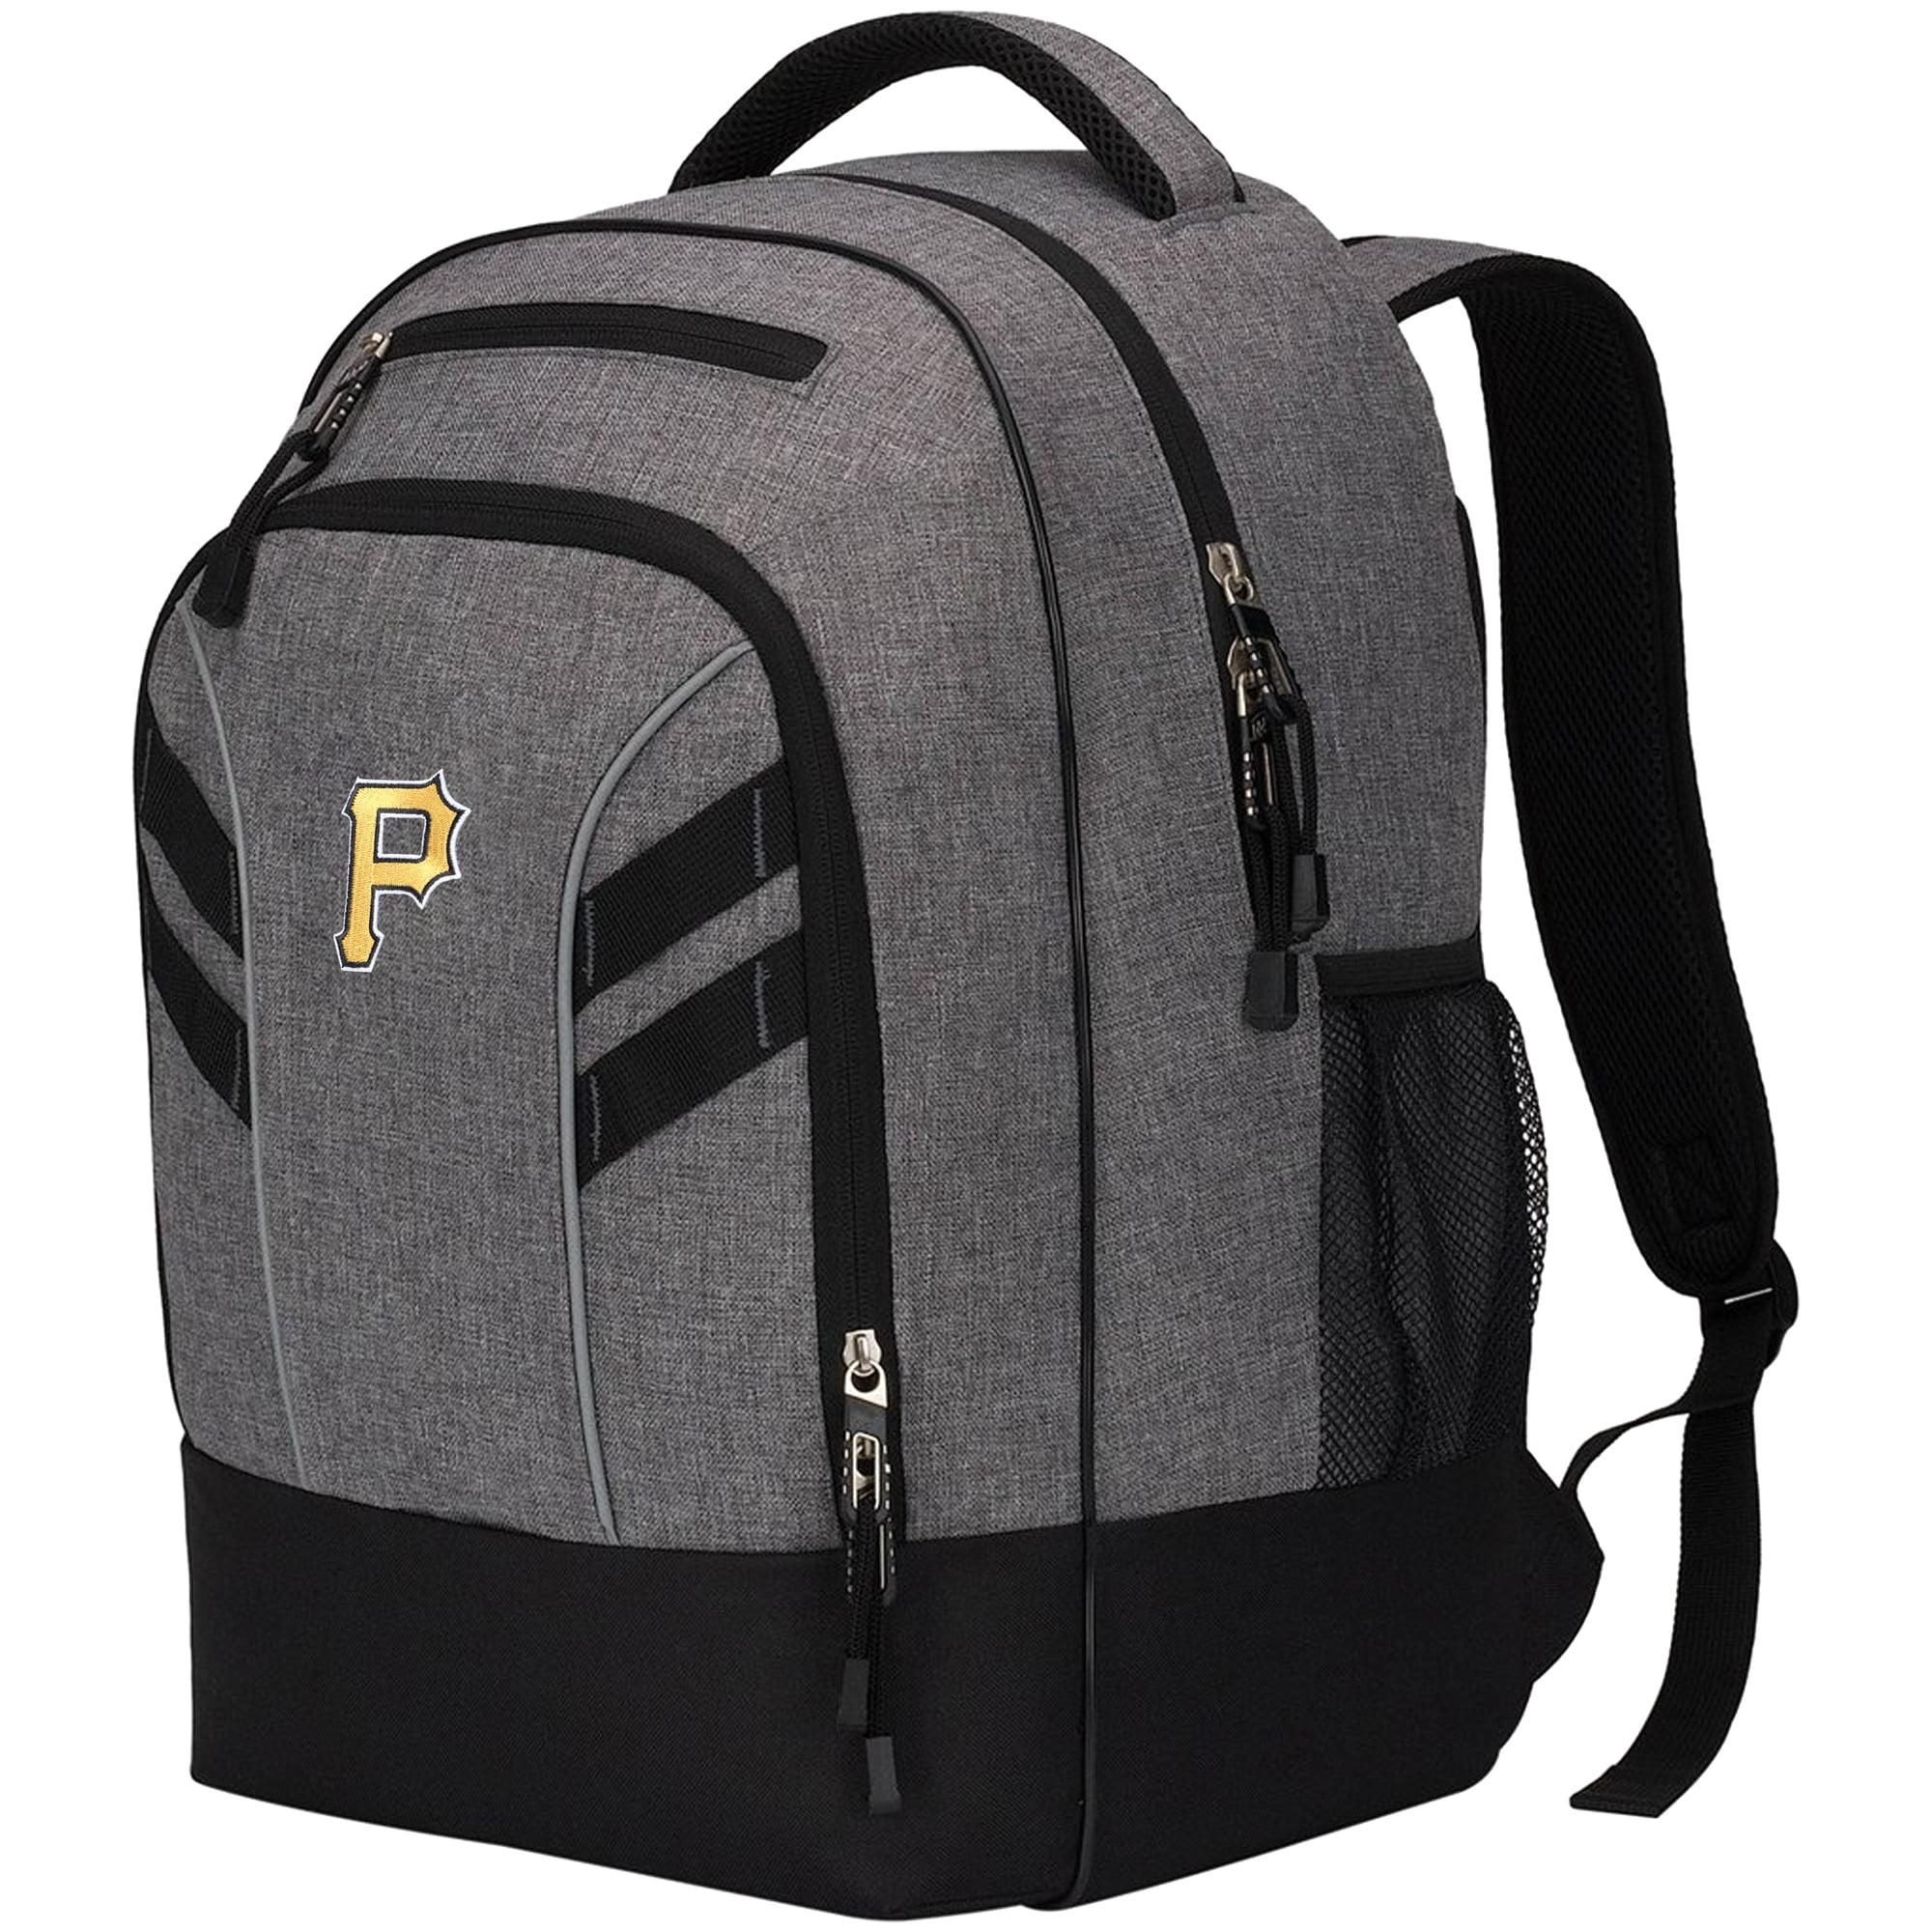 Pittsburgh Pirates The Northwest Company Razor Backpack - No Size